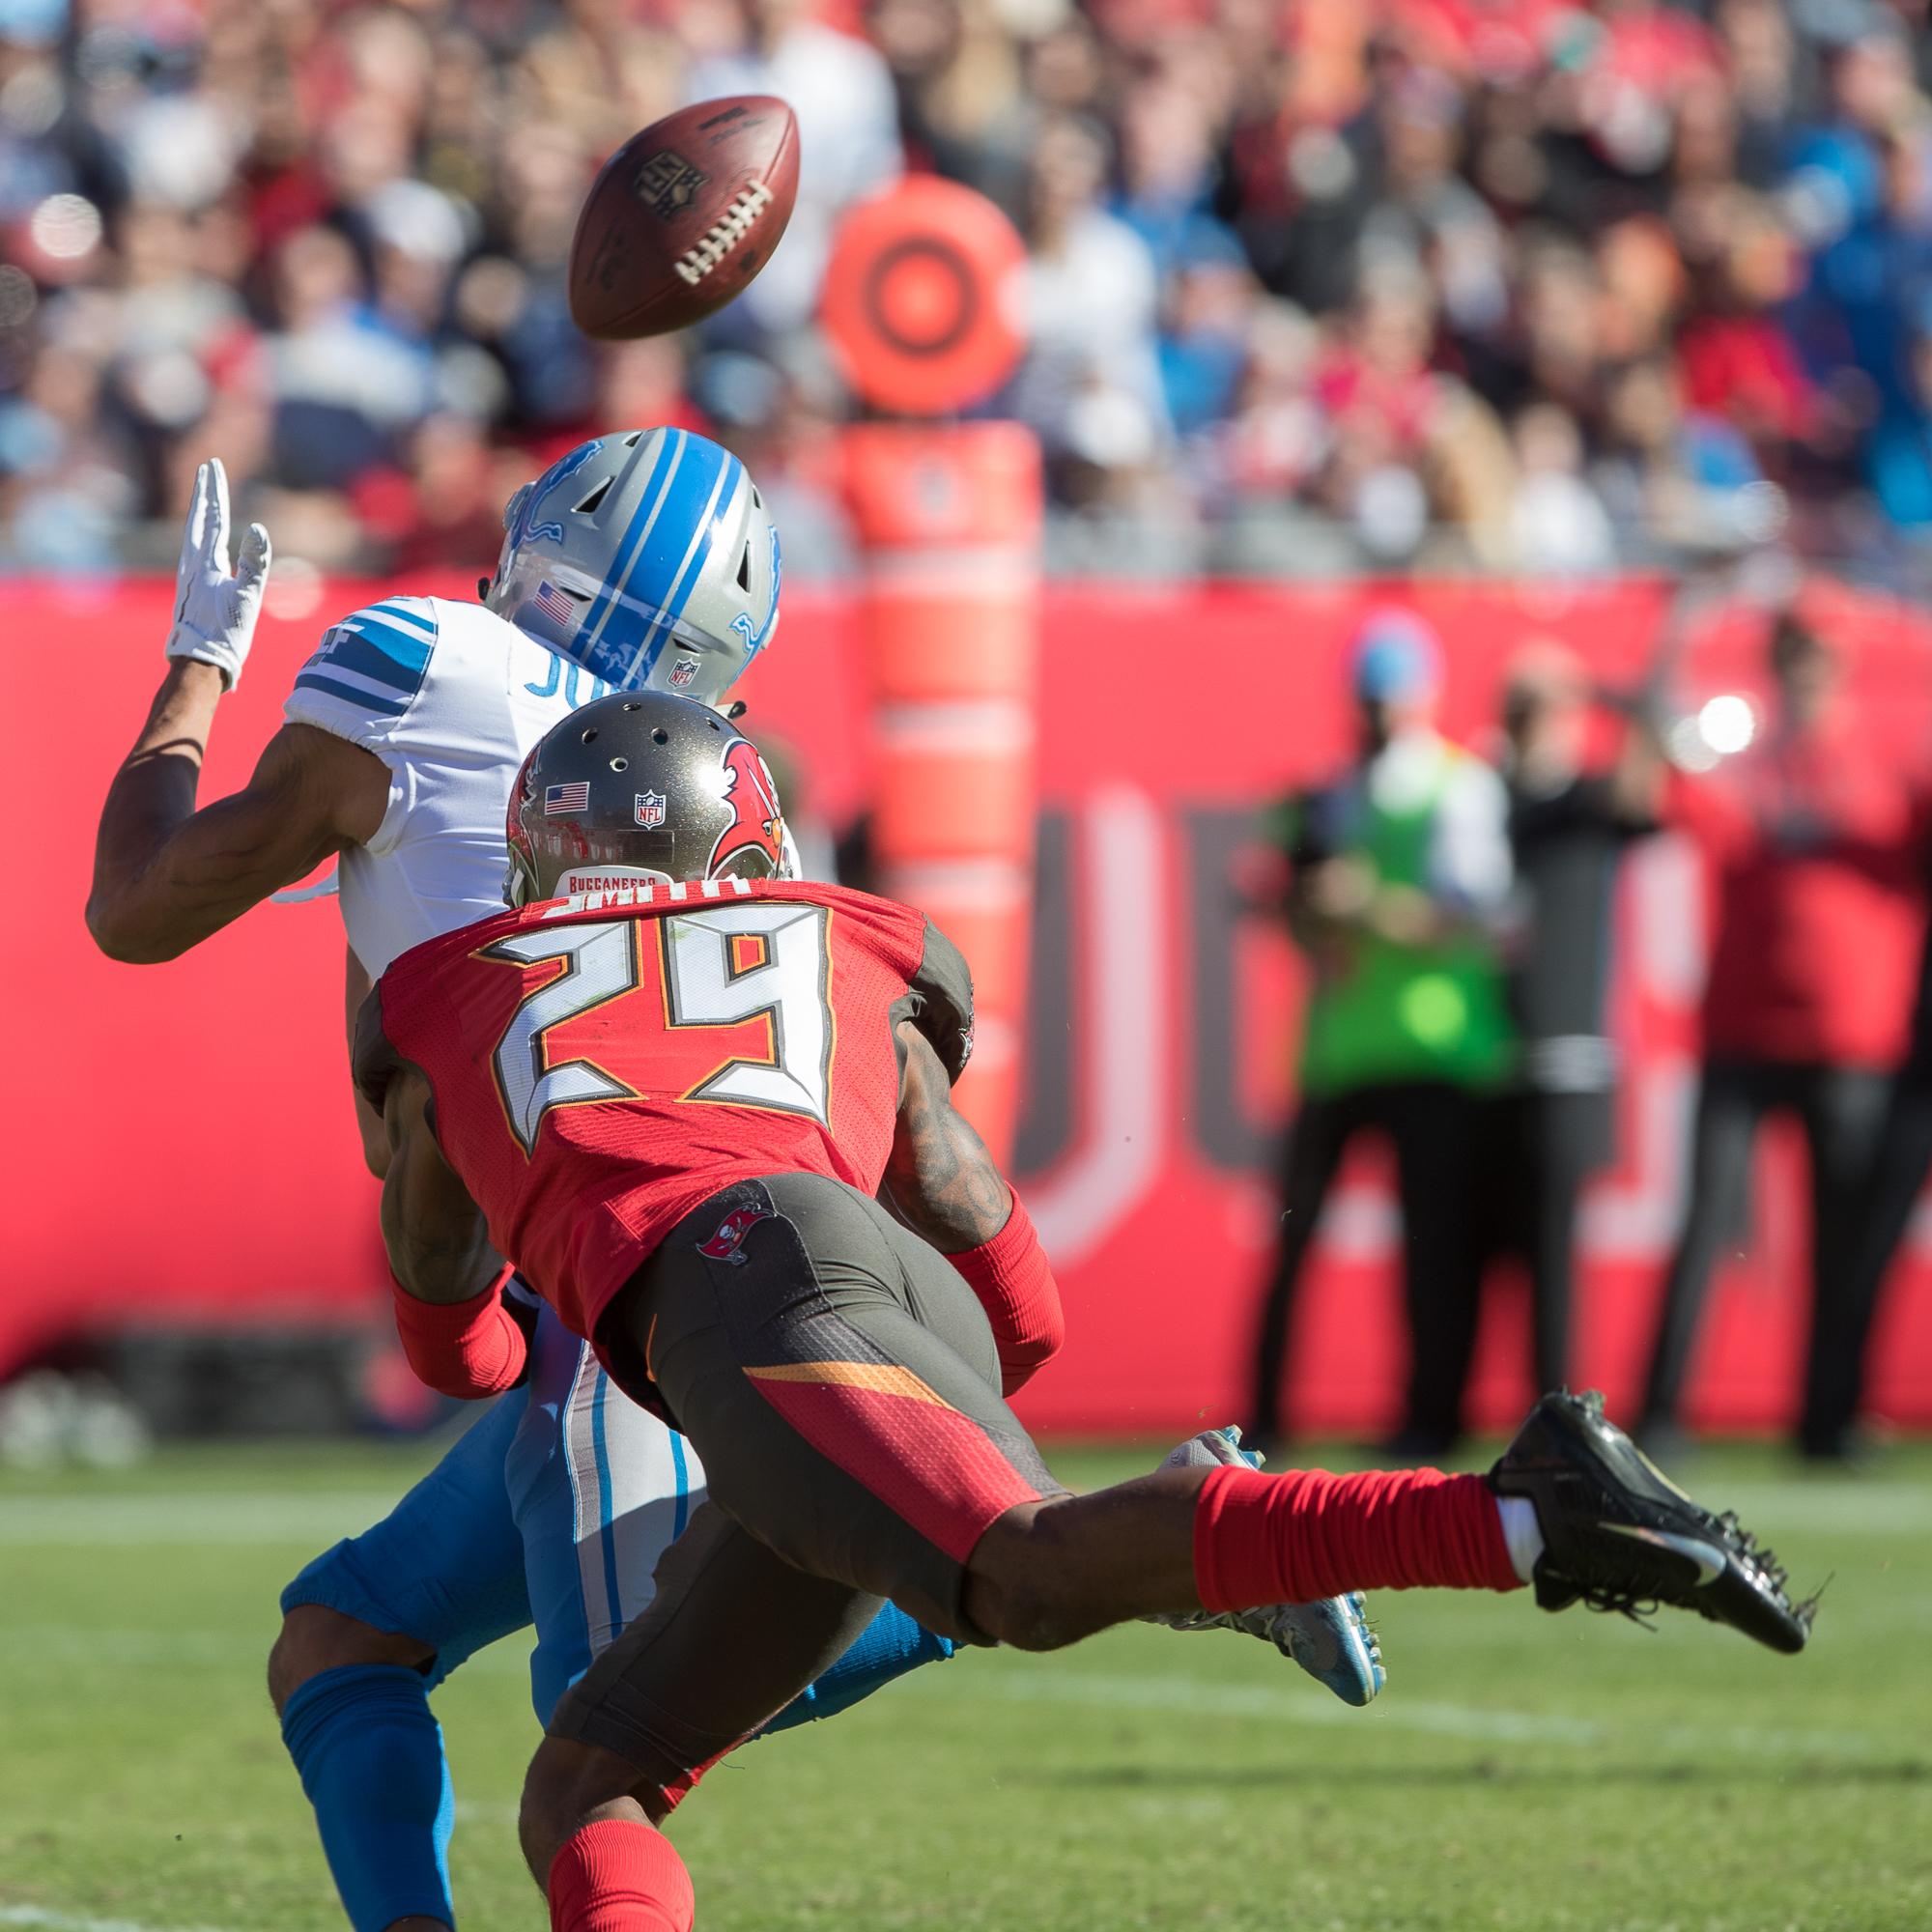 Ryan Smith attempts to stop a catch by Jones./STEVEN MUNCIE